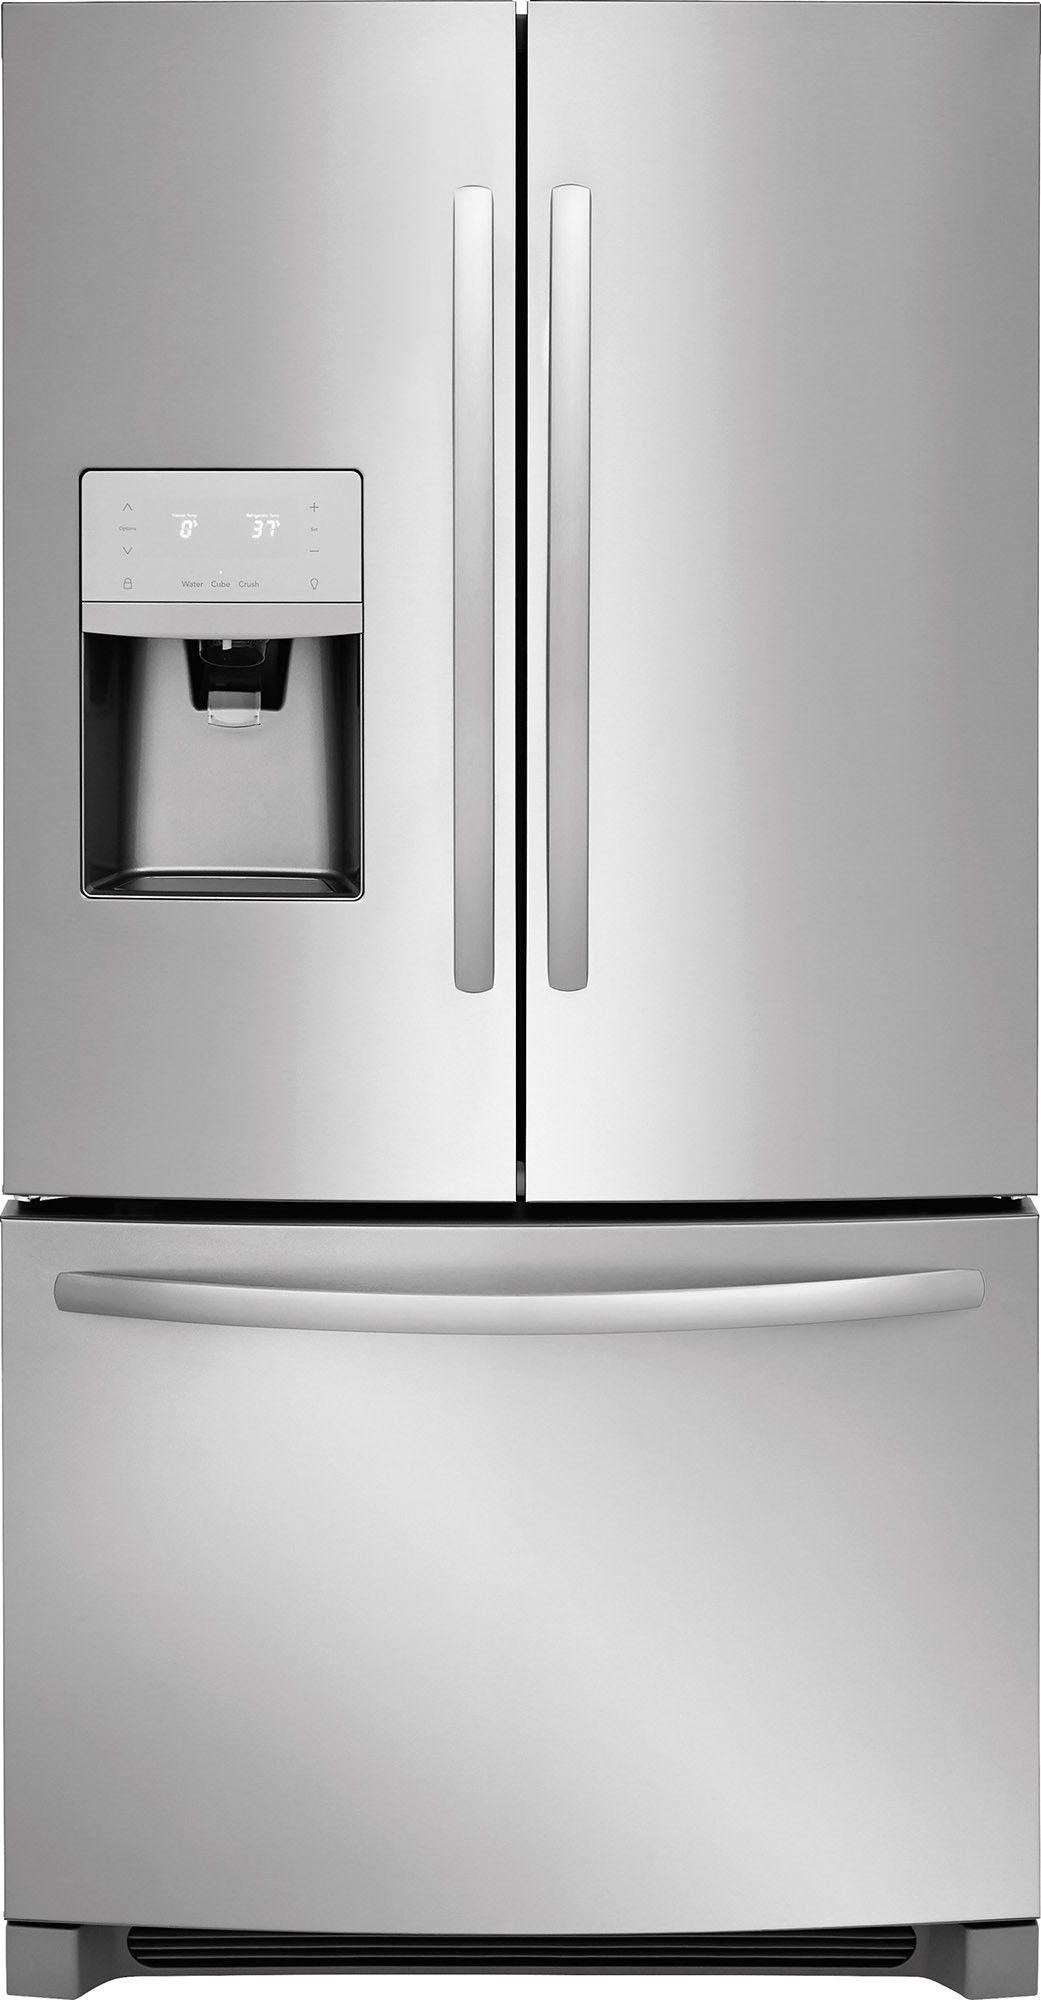 Frigidaire Frreradwmw10437 In 2020 French Door Refrigerator Kitchen Appliance Packages French Doors